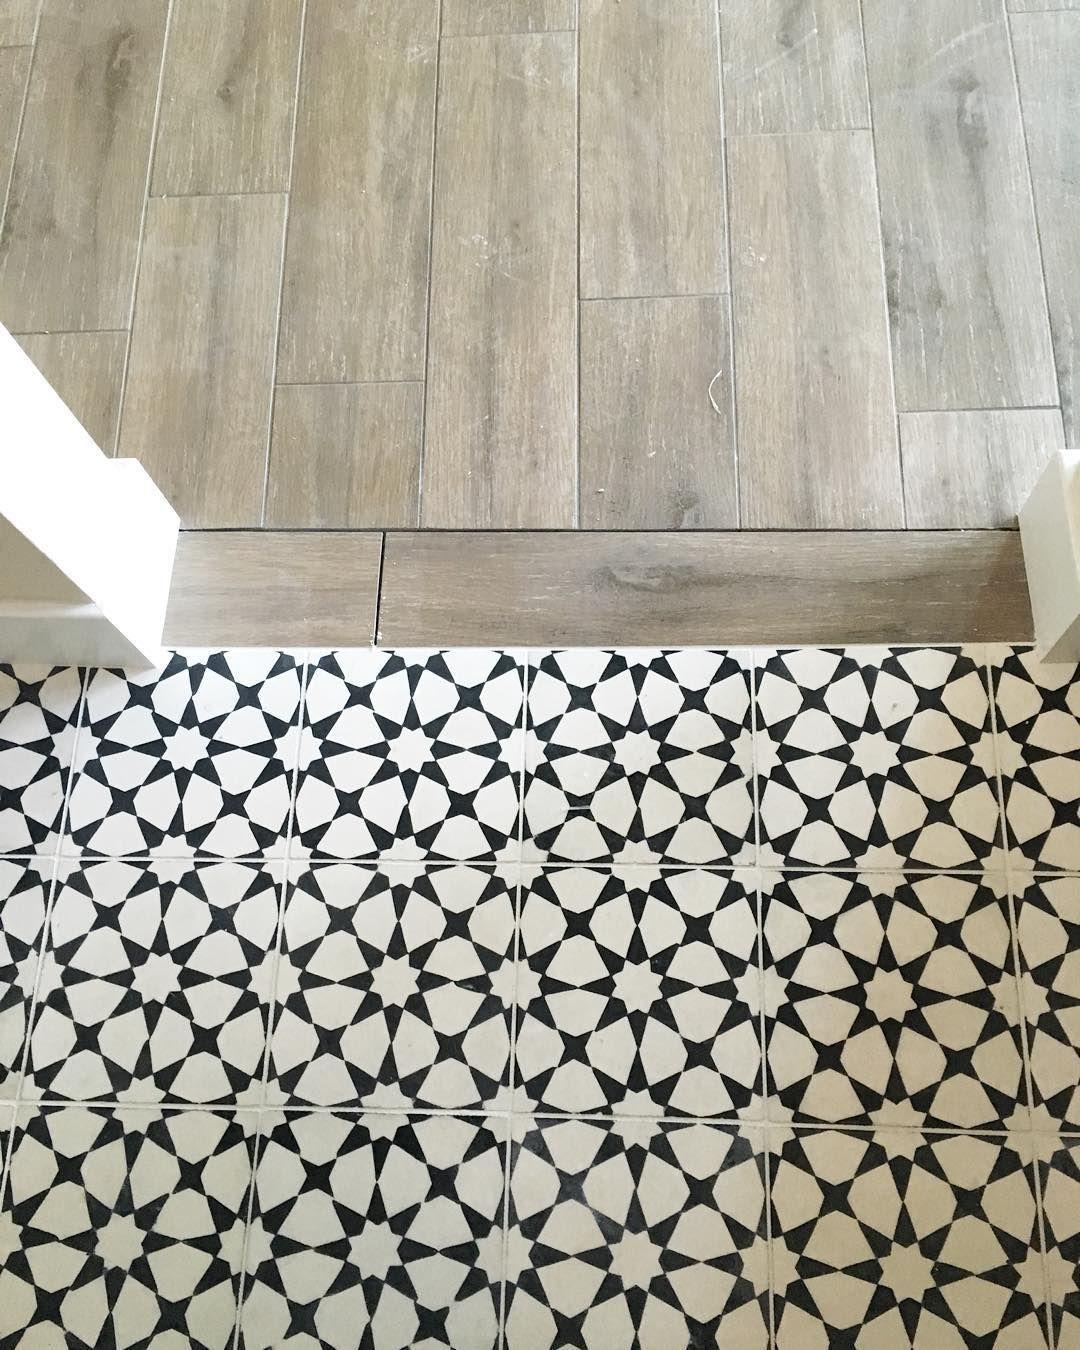 Vinyl That Looks Like Cement Tile Tile Design Ideas Tile Stickers Kitchen Flooring Wall Waterproofing